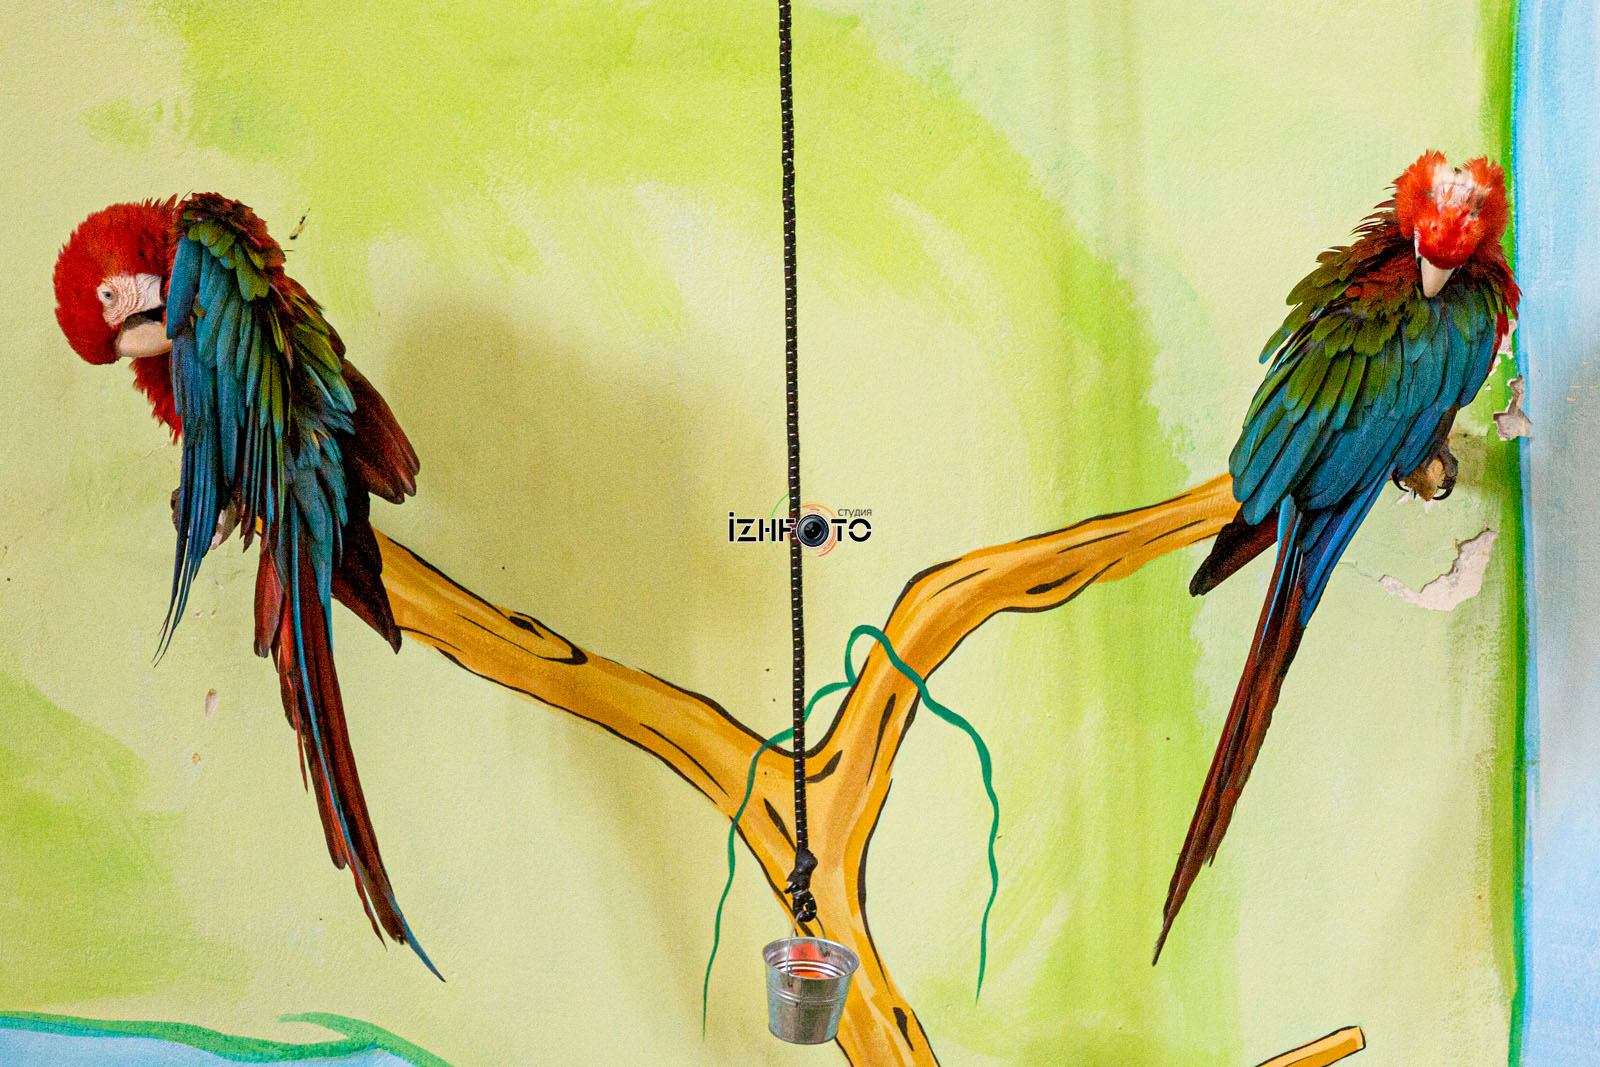 Шоу попугаев в зоопарке Пафоса на Кипре